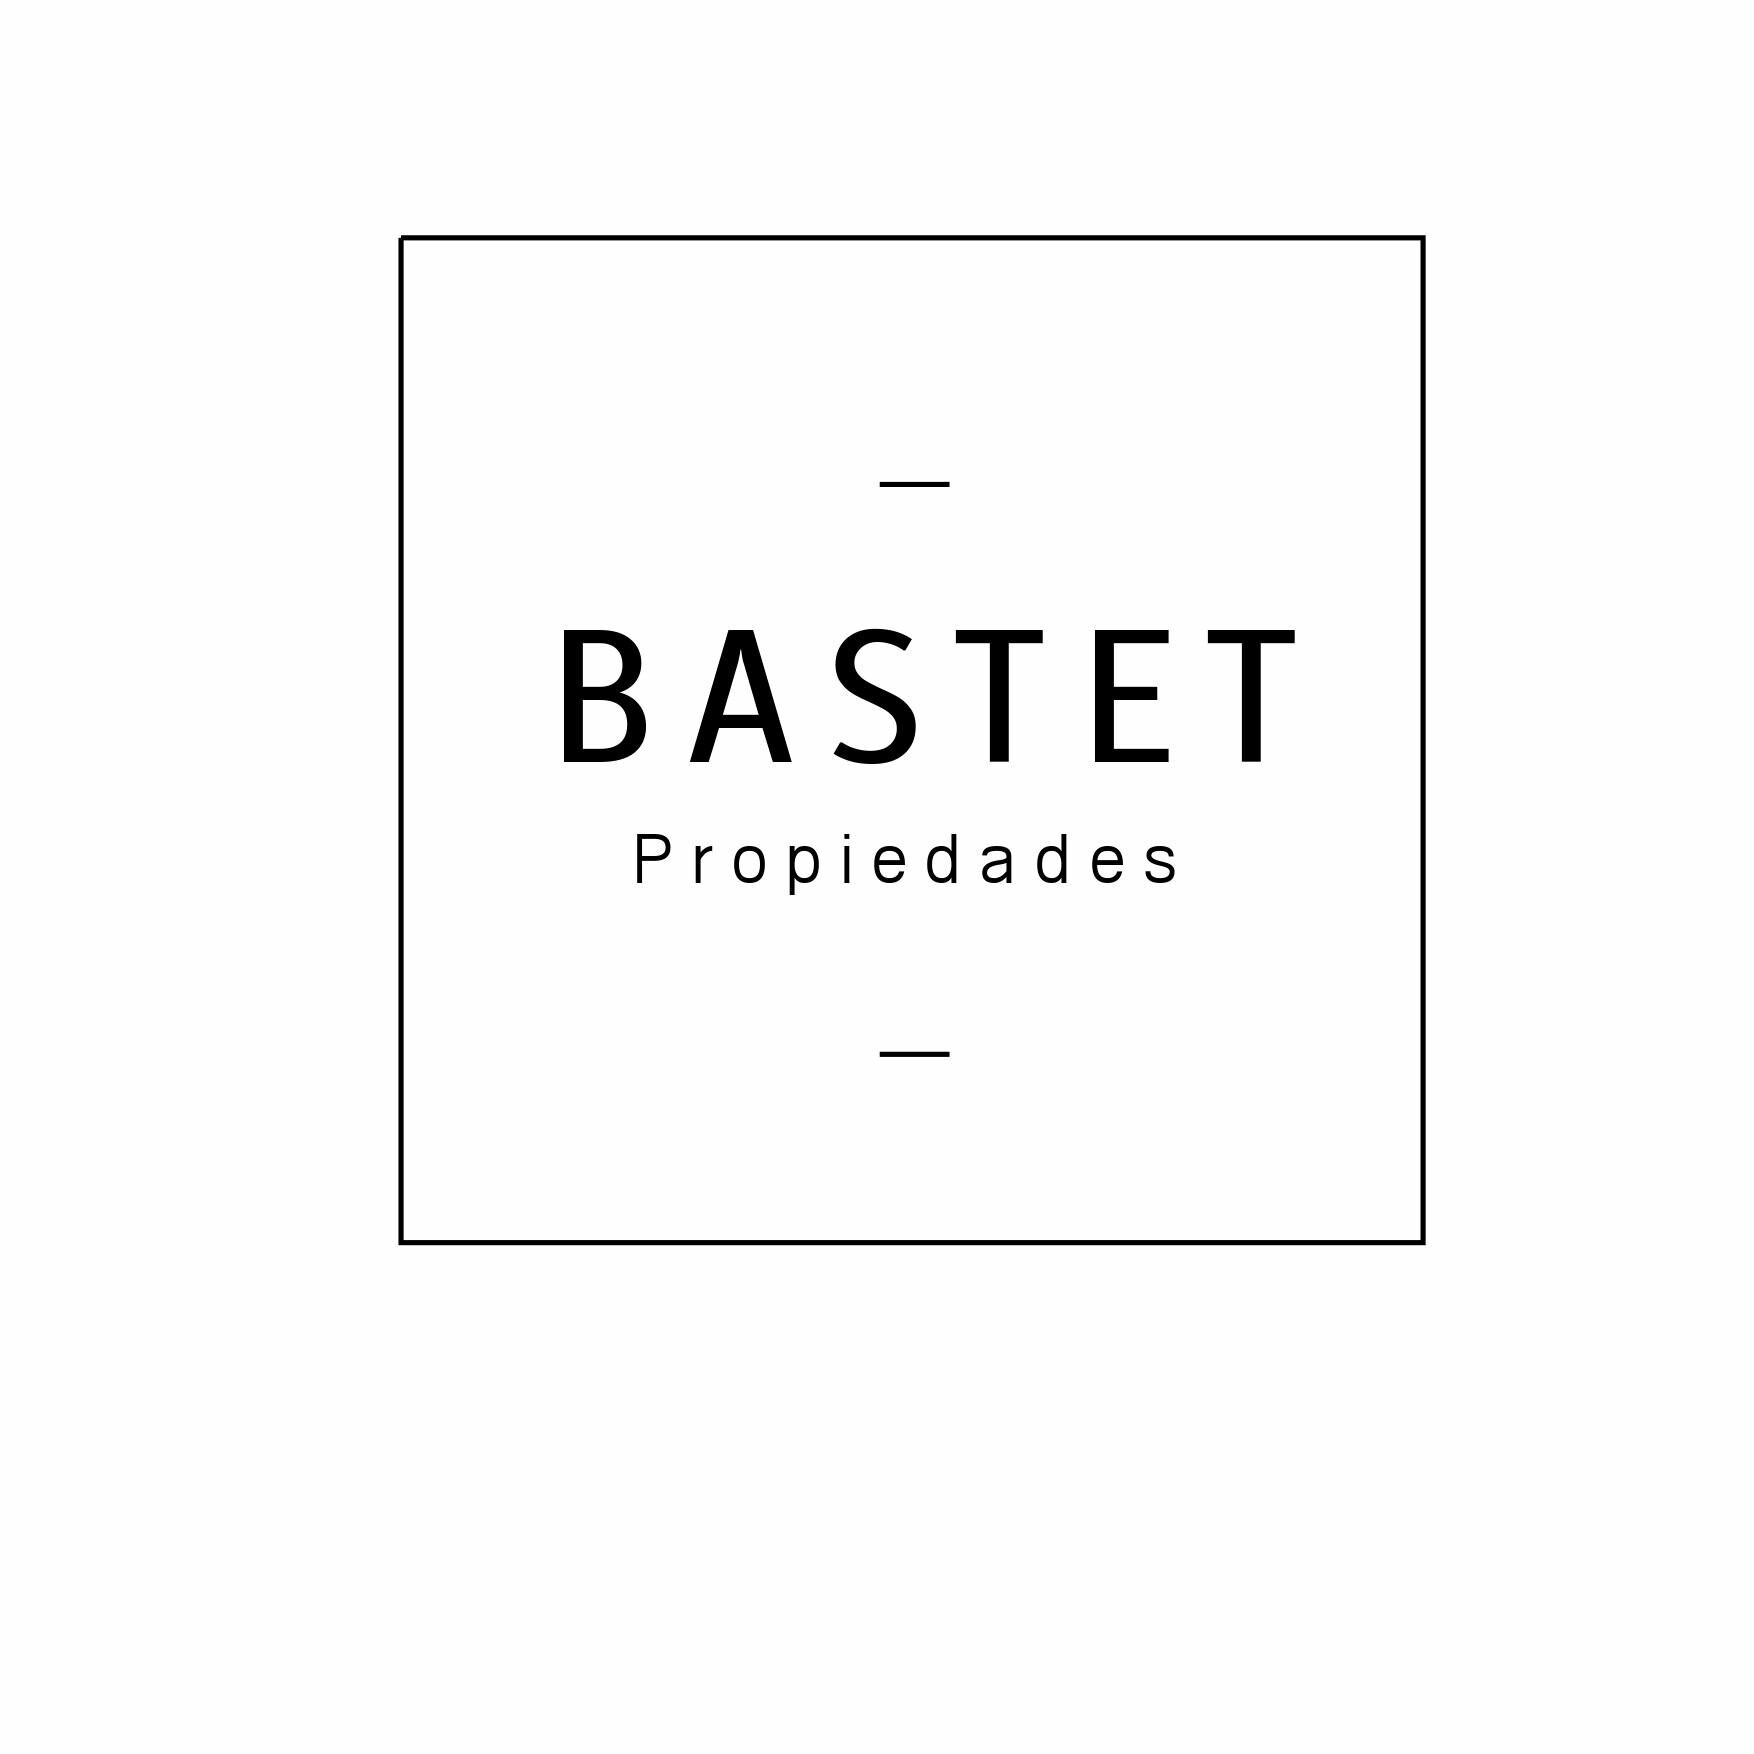 Bastet Propiedades